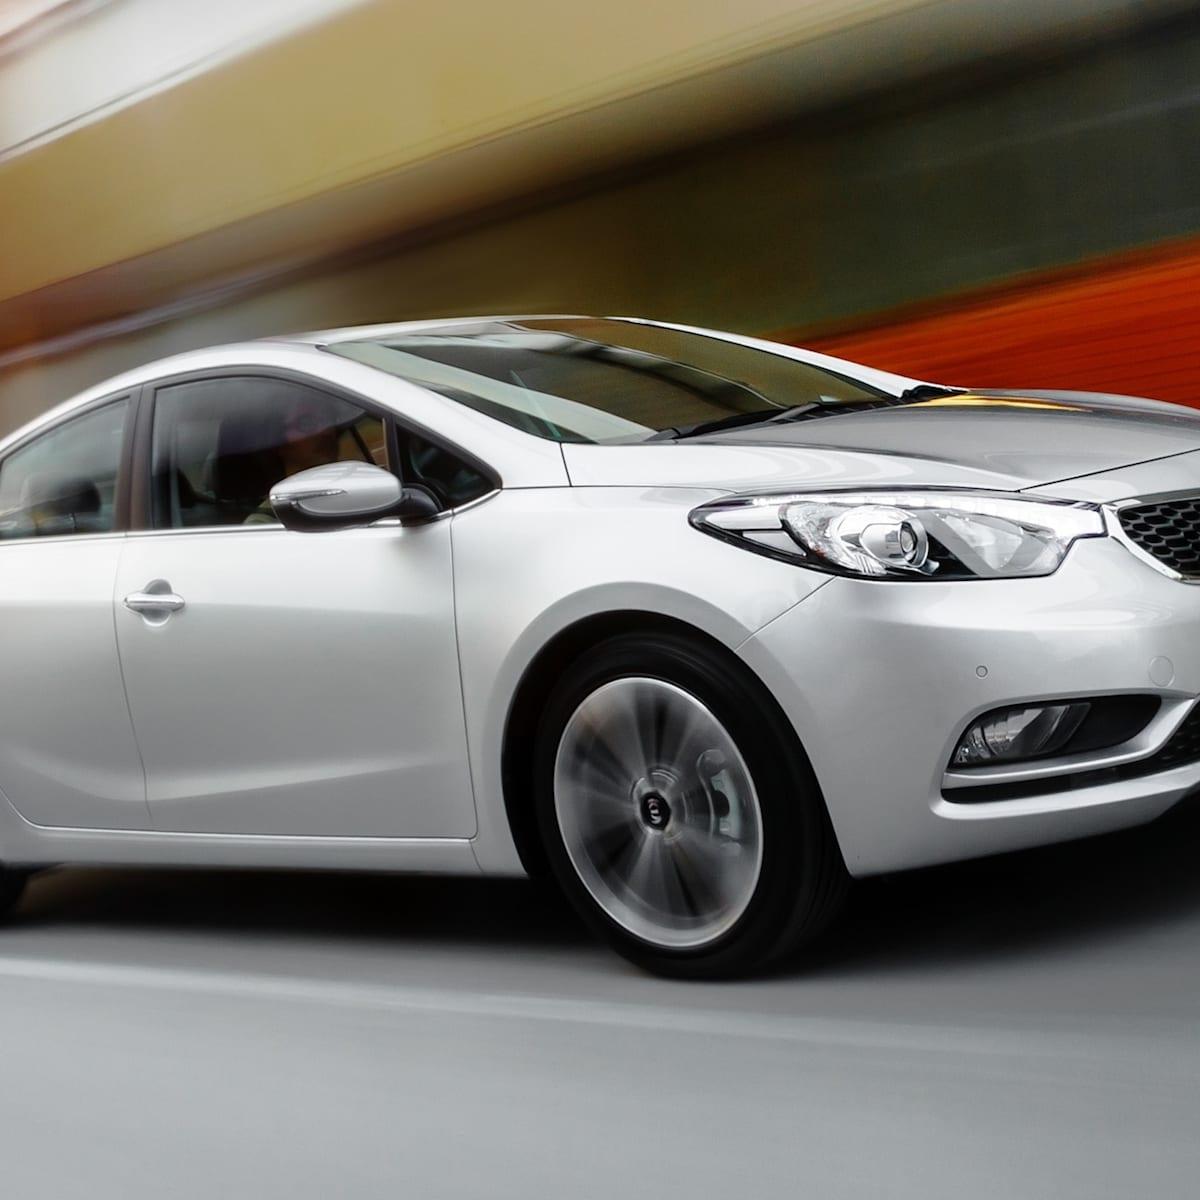 2013 Kia Cerato Review | CarAdvice